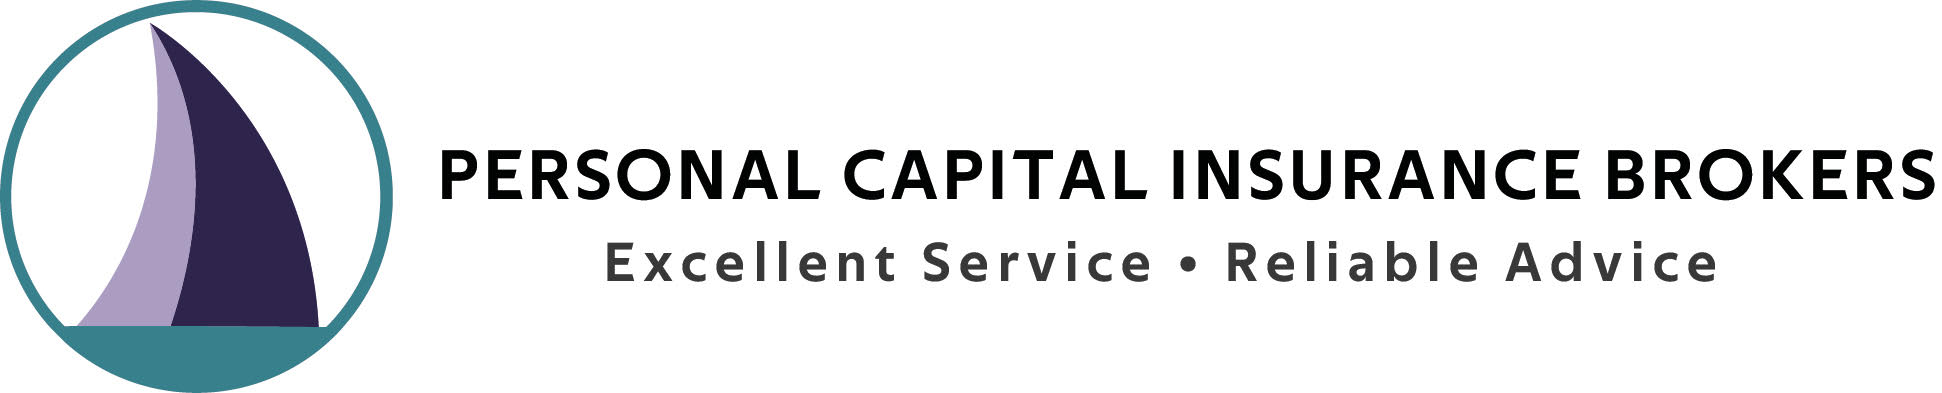 Personal Capital Insurance Brokers - Financial Advisers